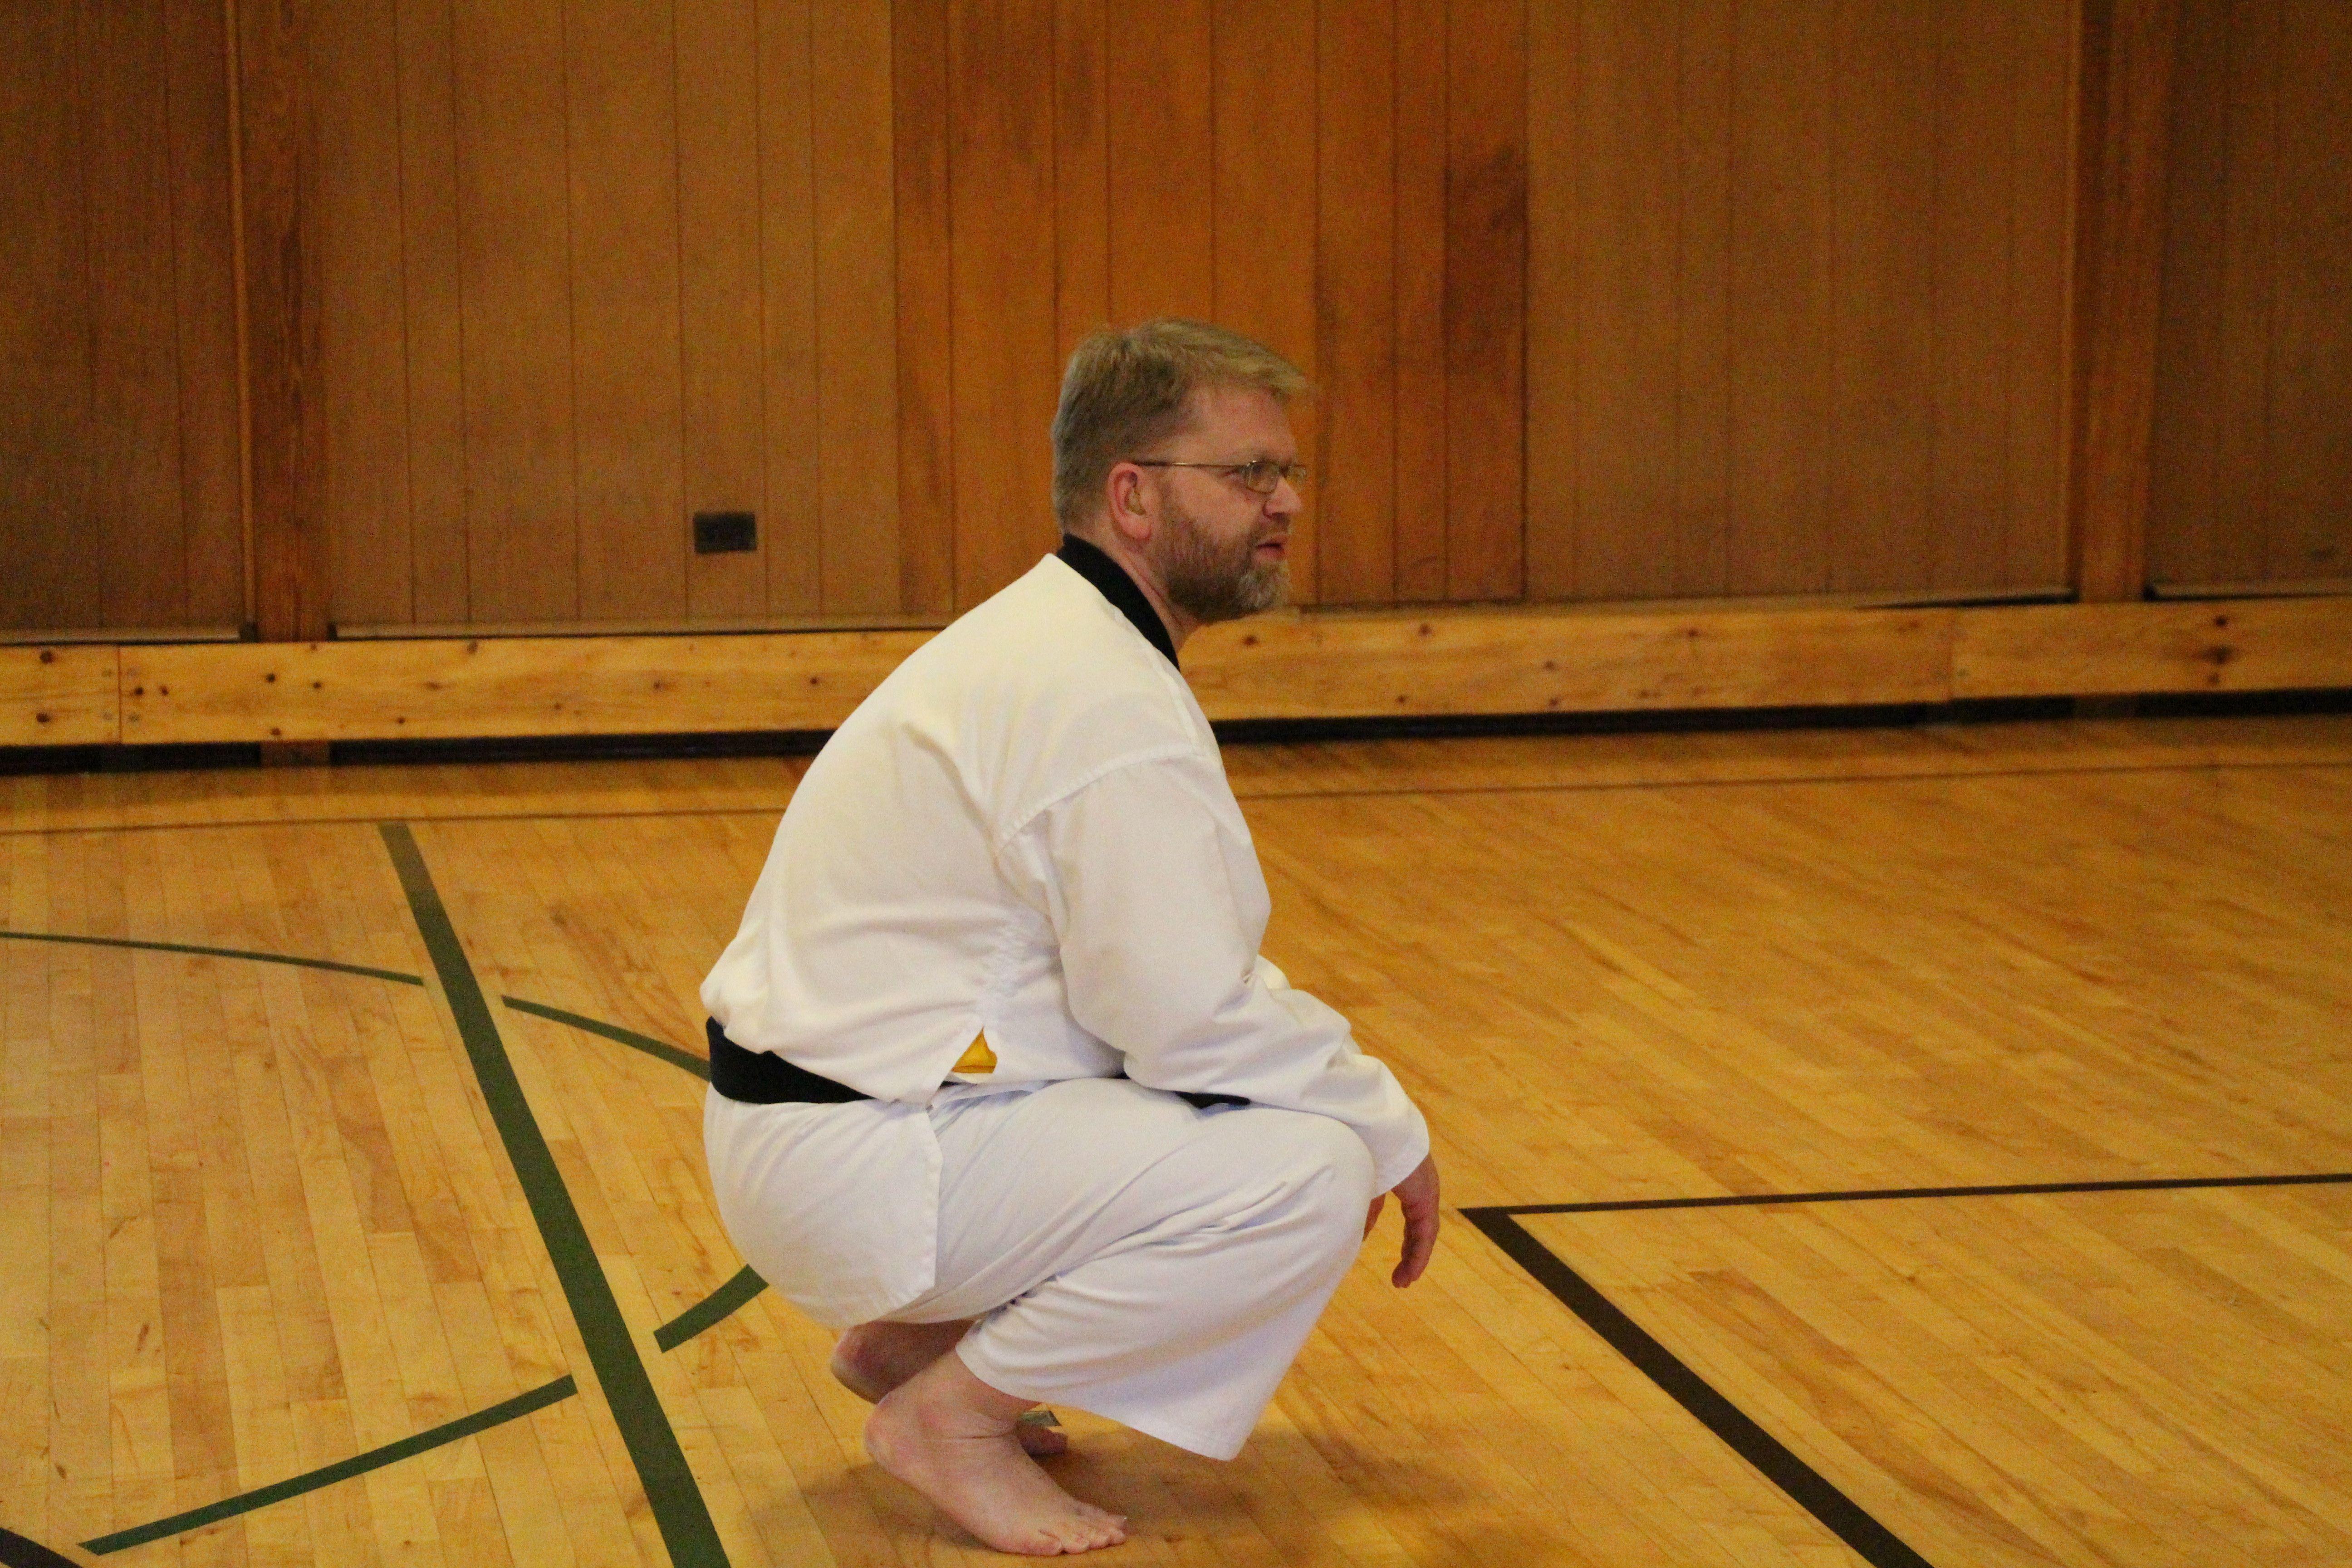 a brief history of taekwondo Taekwondo (/ ˌ t aɪ k w ɒ n ˈ d oʊ /, uk also / ˌ t aɪ ˈ k w ɒ n d oʊ / from korean 태권도/跆拳道 [tʰɛk͈wʌndo] ( listen)) is a korean martial art, characterized by its emphasis on head-height kicks, jumping and spinning kicks, and fast kicking techniques.